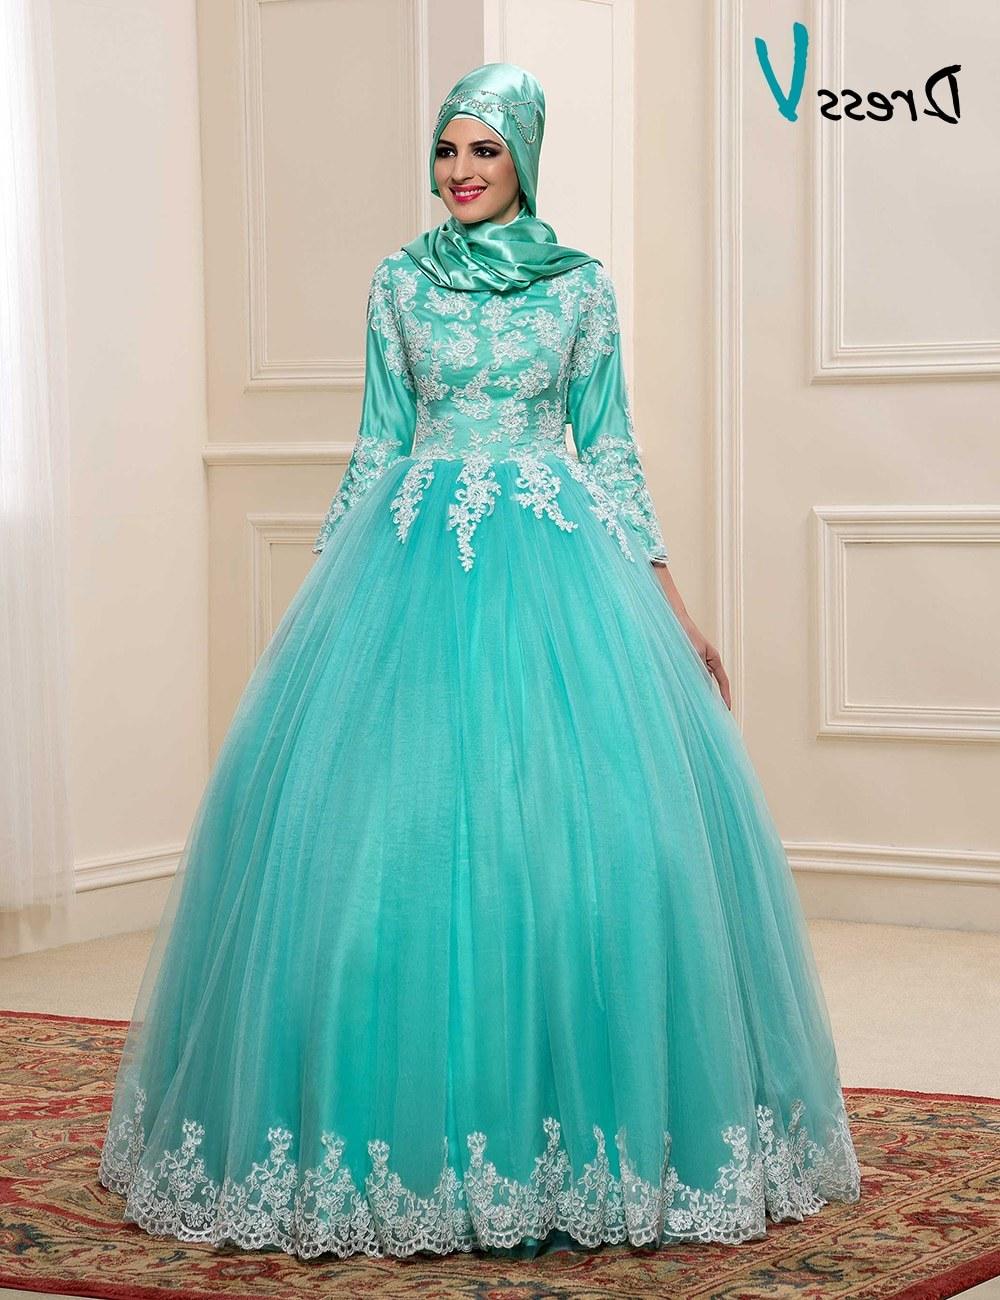 Inspirasi Foto Baju Pengantin Muslim Modern Wddj islamic Hijab Wedding Dresses – Fashion Dresses